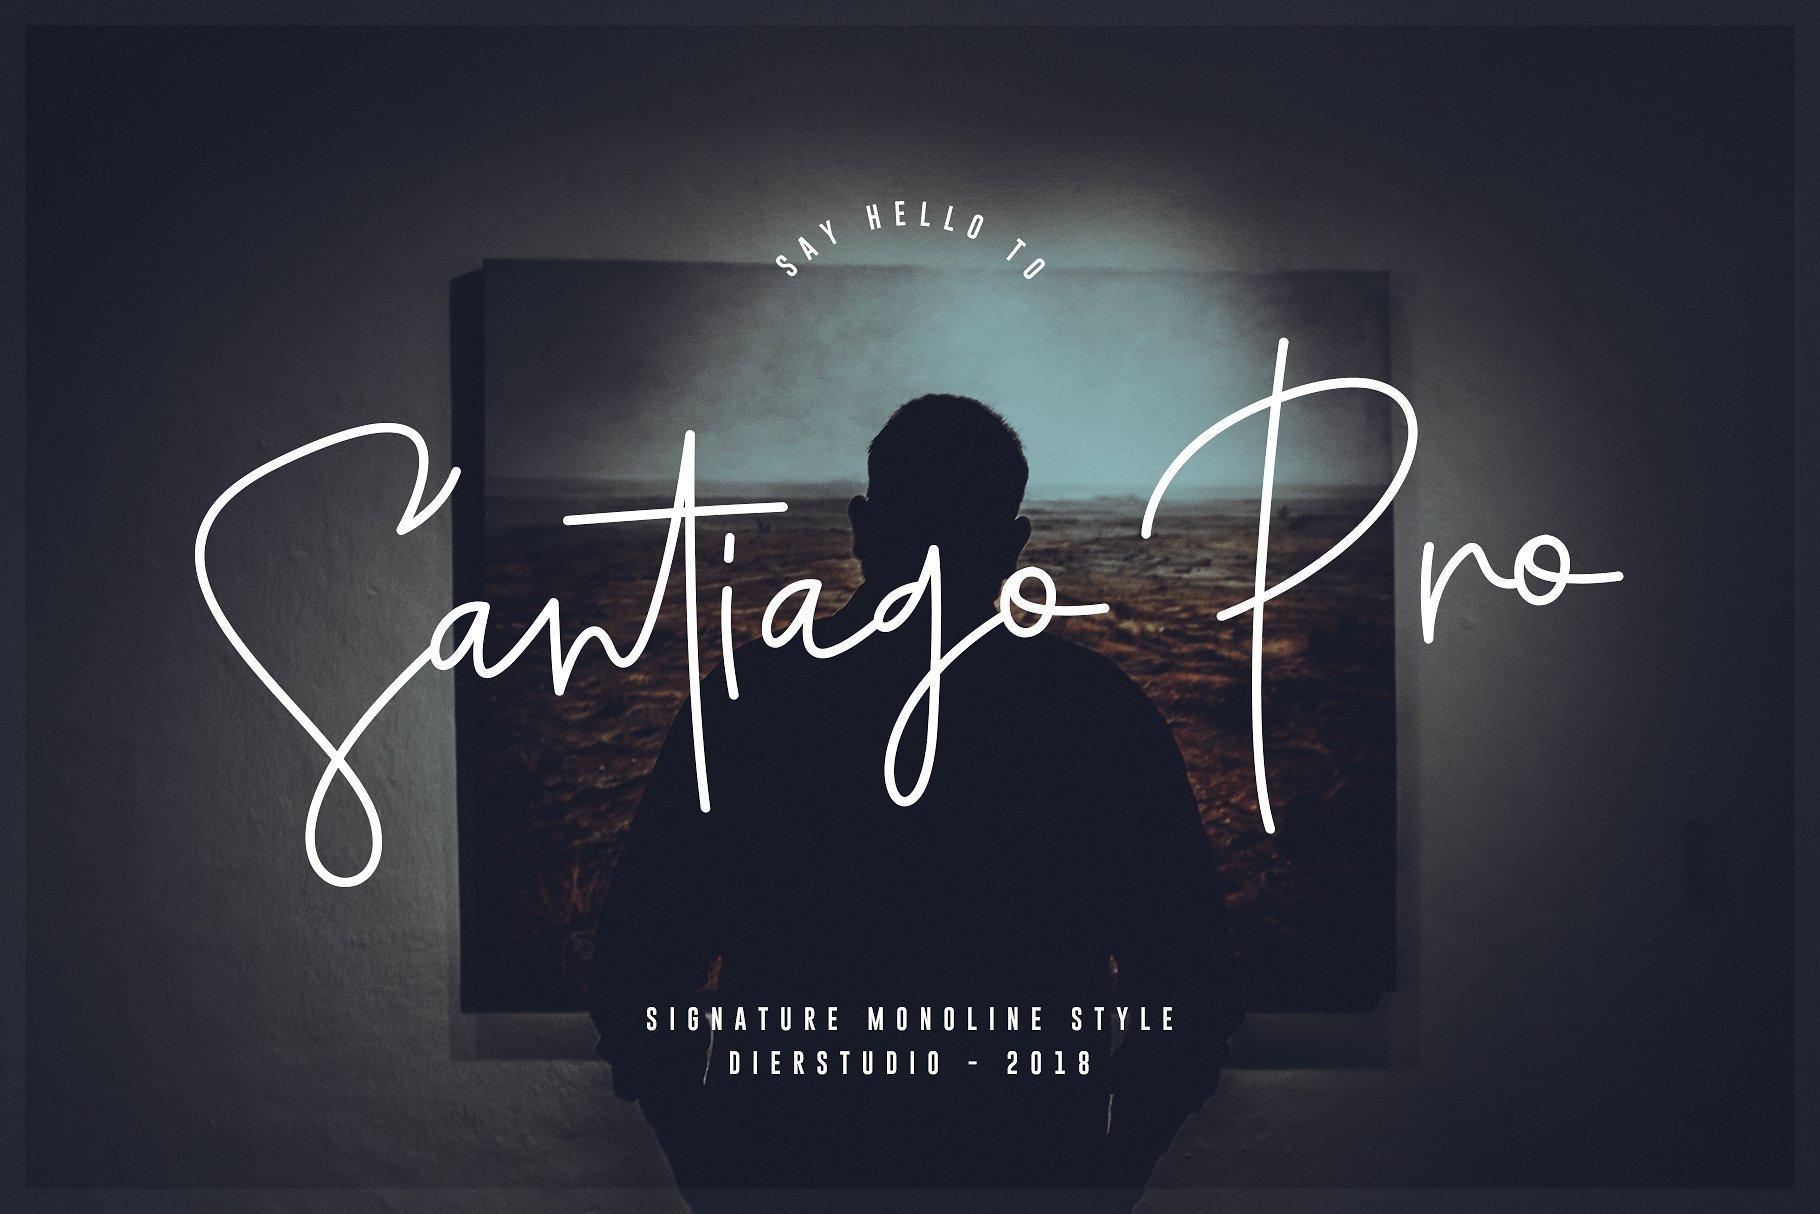 santiago-pro-signature-font